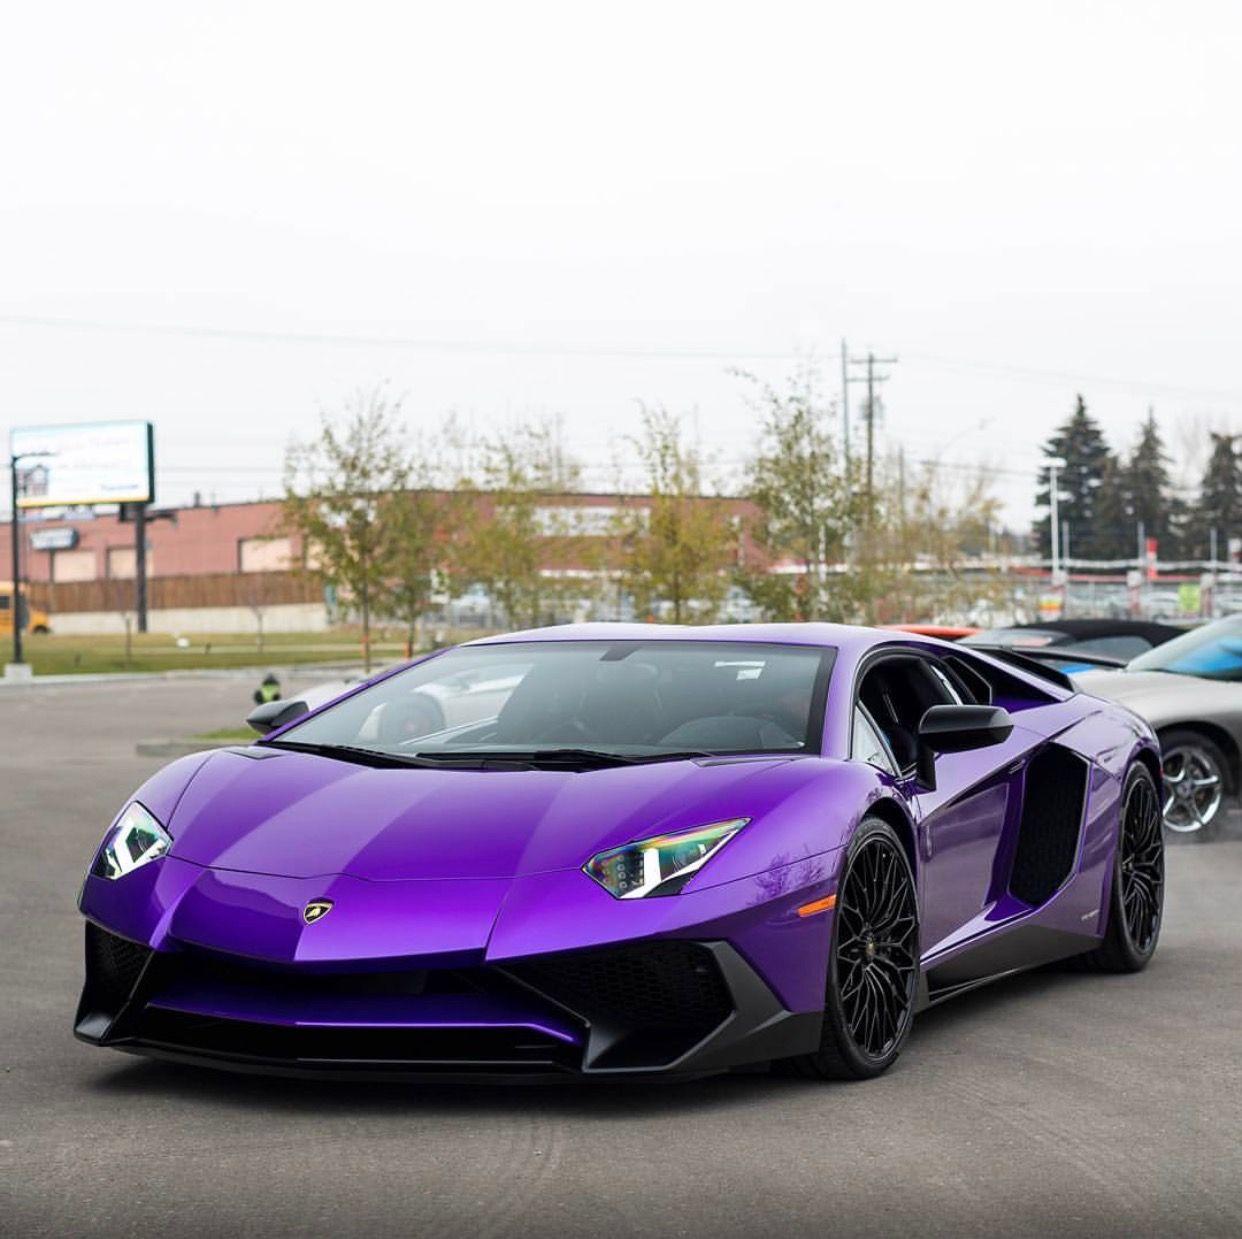 Lamborghini: Lamborghini Aventador Super Veloce Coupe Painted In Viola